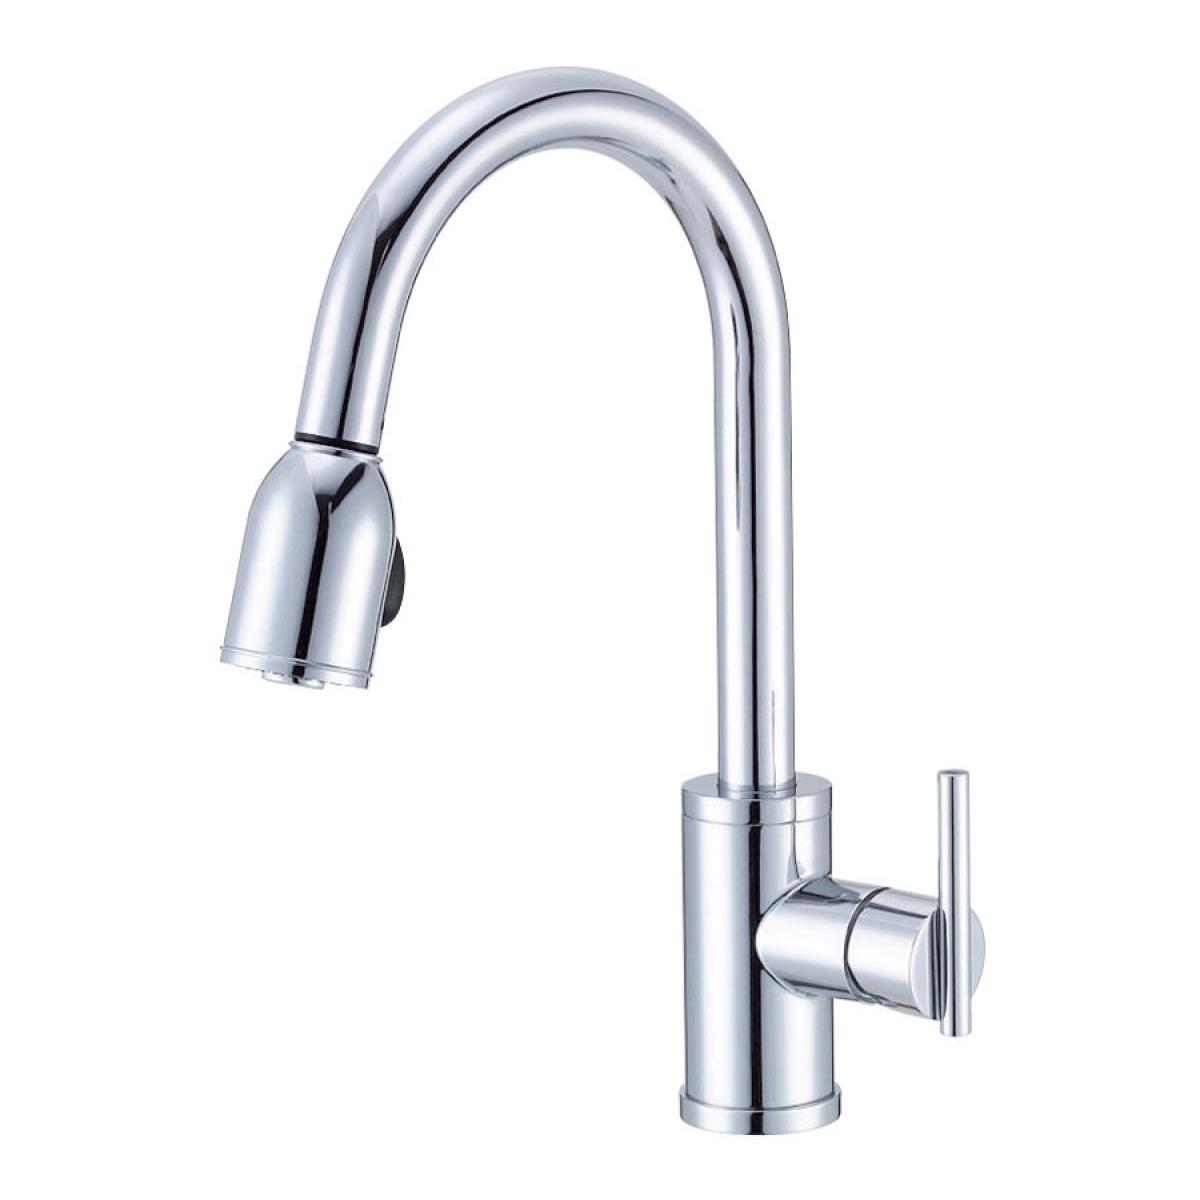 Bath4All - Danze D457058 Chrome Pull Down Spray Kitchen ...